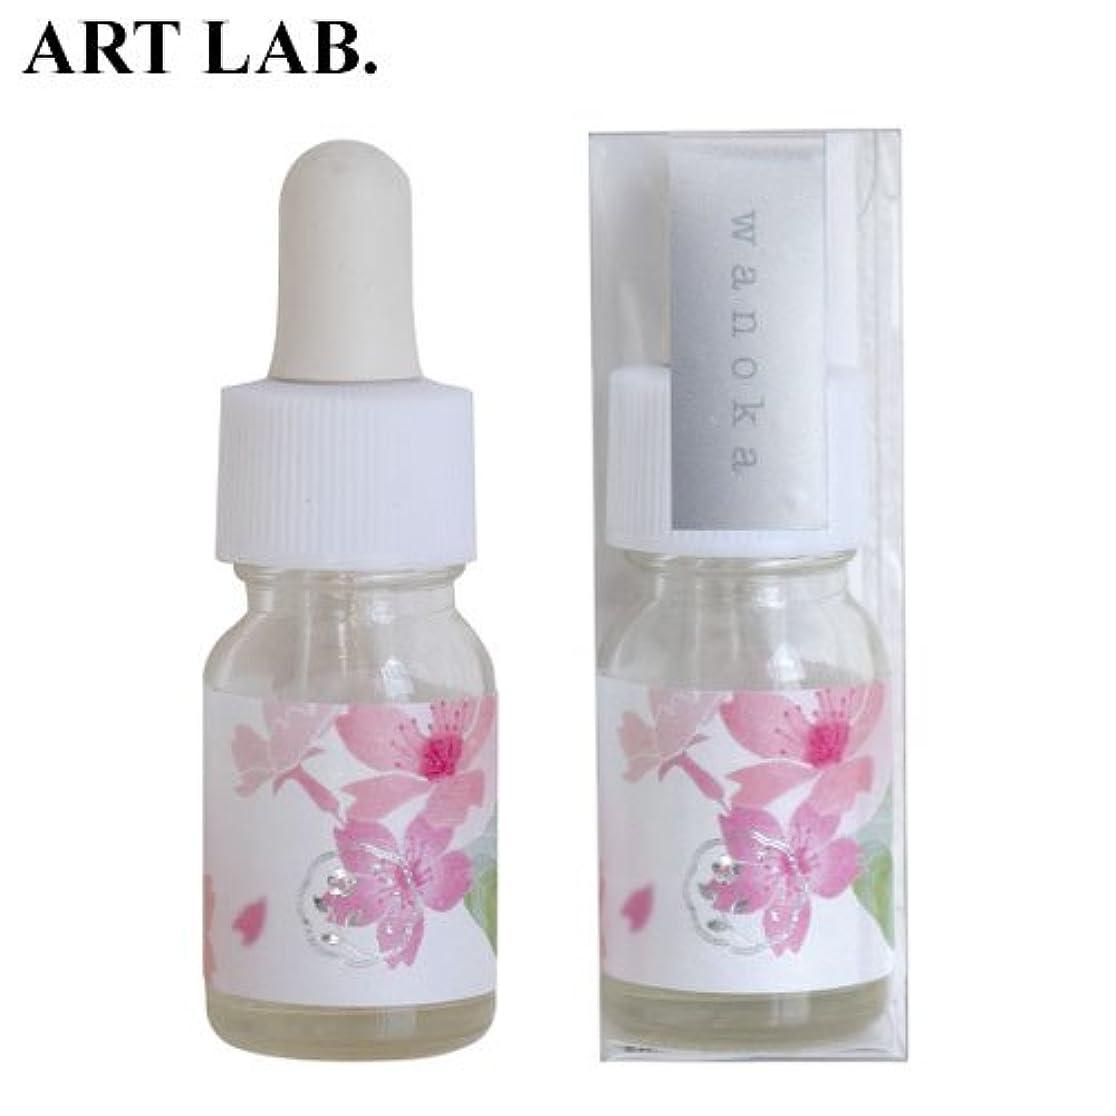 wanoka香油アロマオイル桜《桜をイメージした甘い香り》ART LABAromatic oil